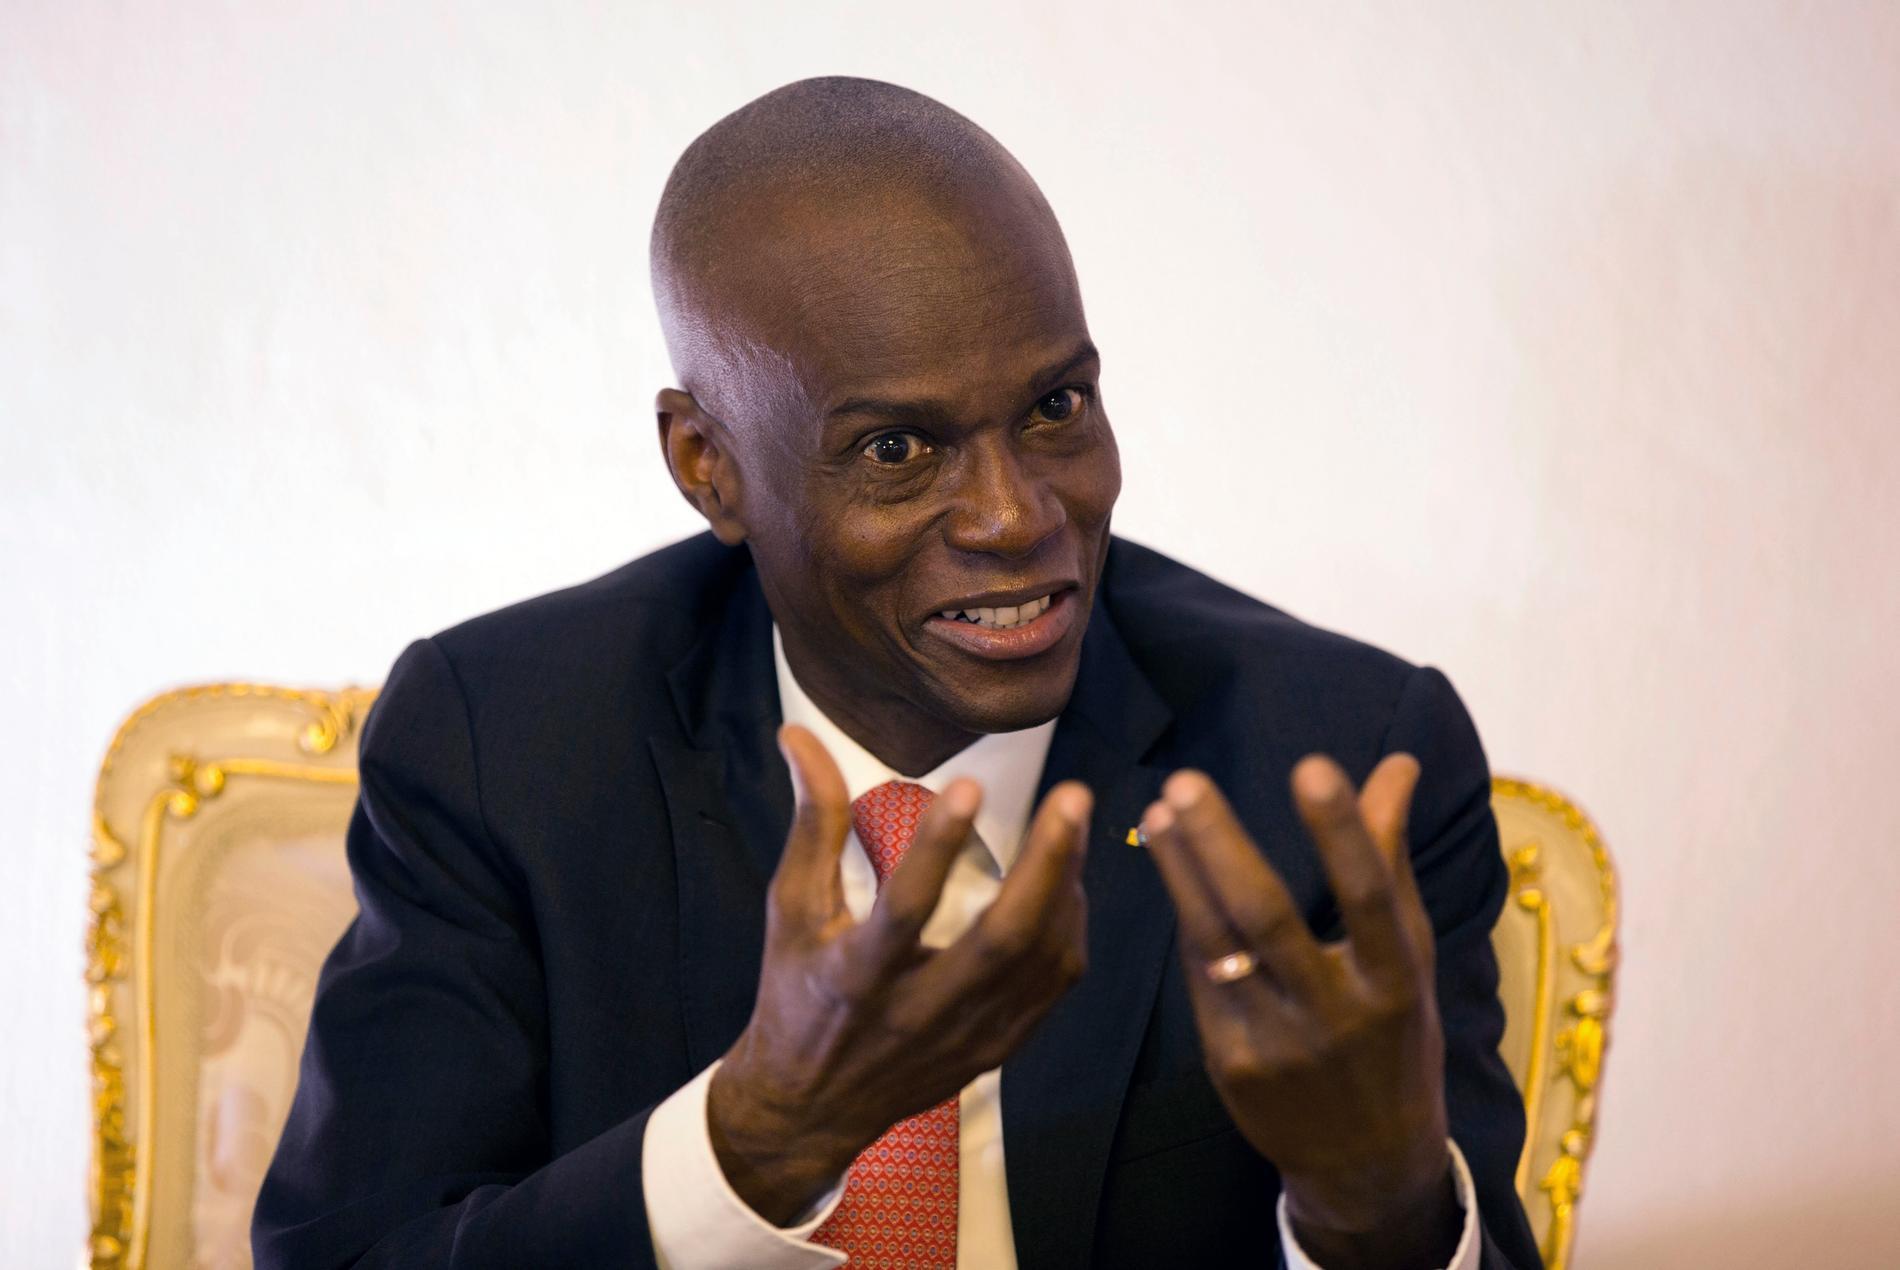 Jovenel Moïse var Haitis president 2017–2021. I somras sköts han till döds i sitt hem.